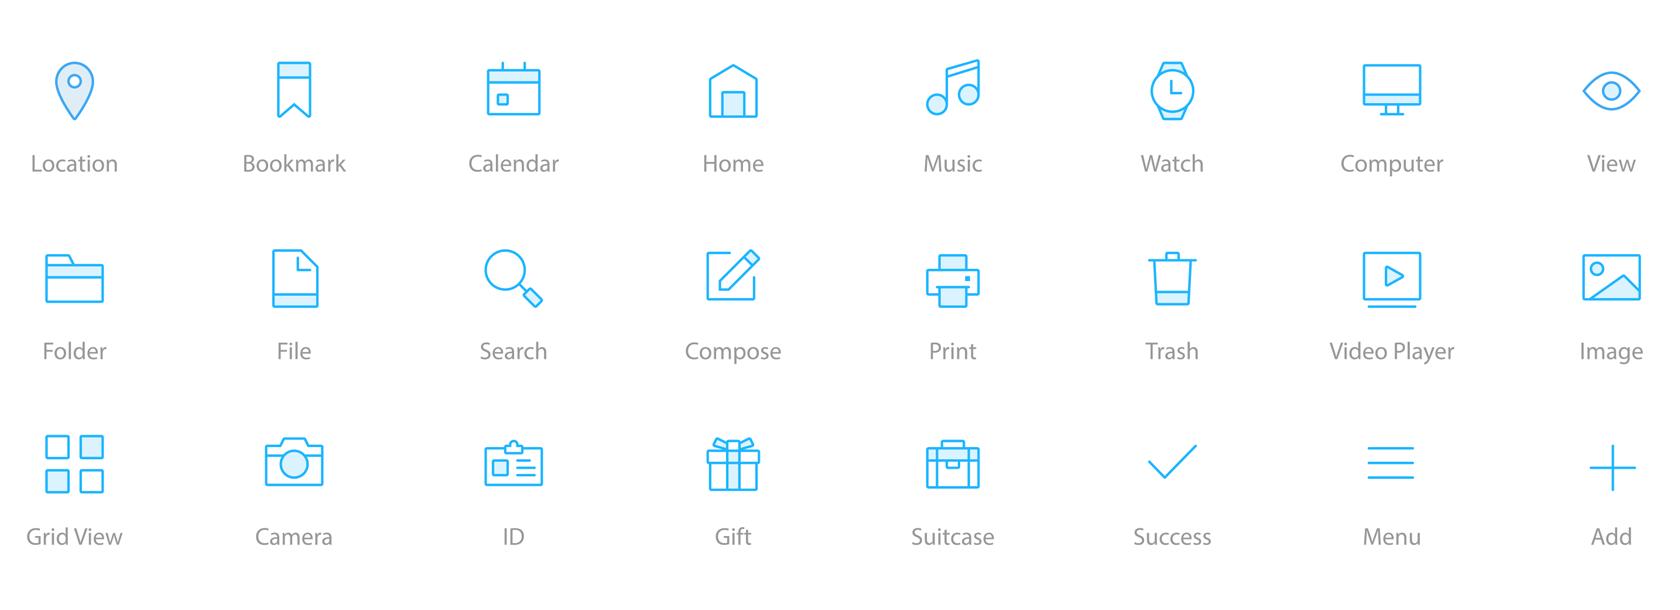 Ikon dalam antarmuka pengguna dapat dikenali secara instan - desain interaksi yang hebat